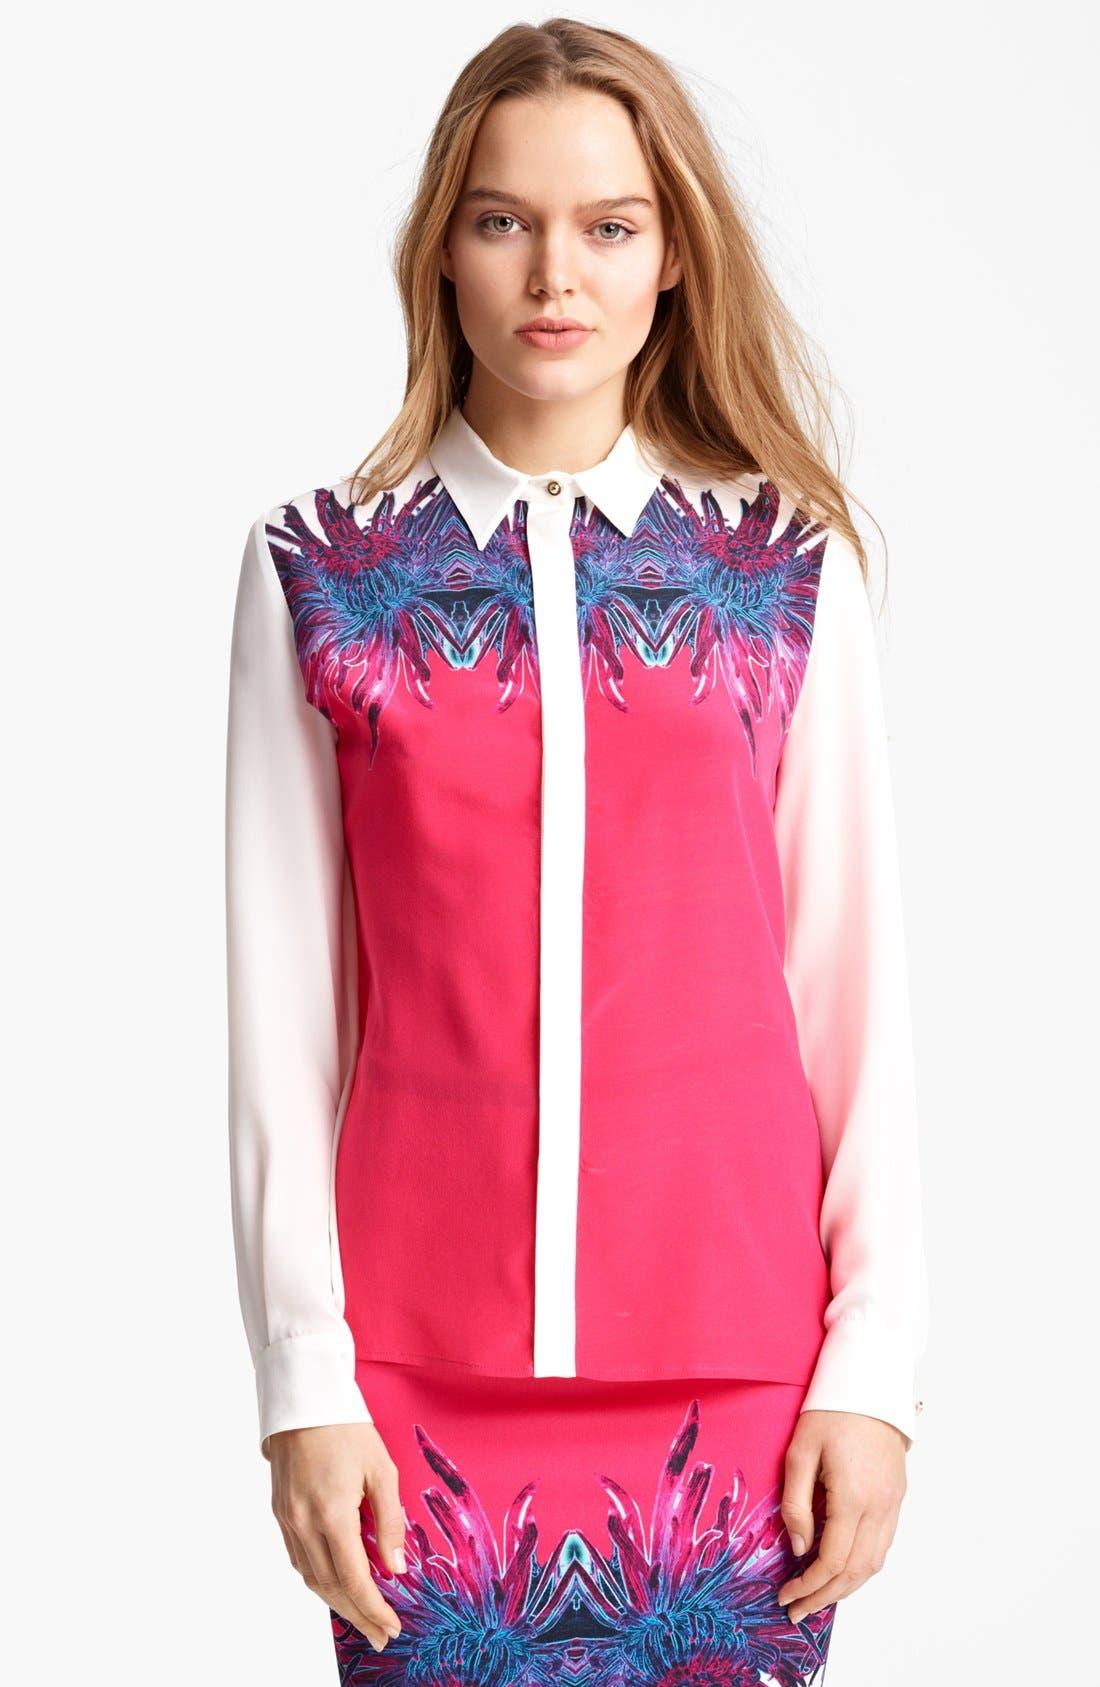 Alternate Image 1 Selected - Roberto Cavalli Blouse & Skirt